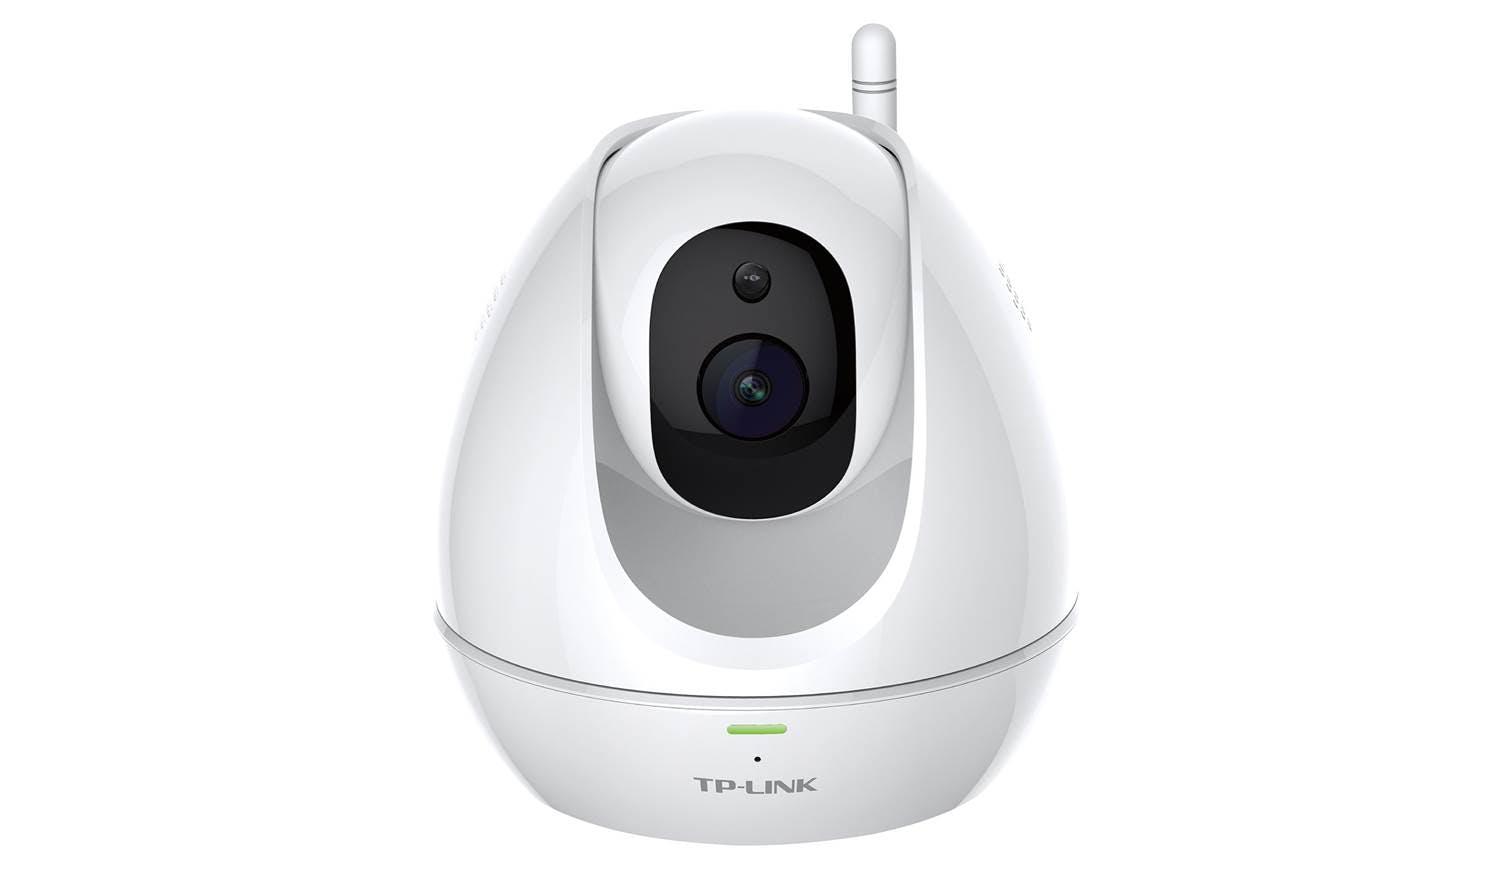 TP-Link NC450 HD Pan/Tilt Wi-Fi Camera